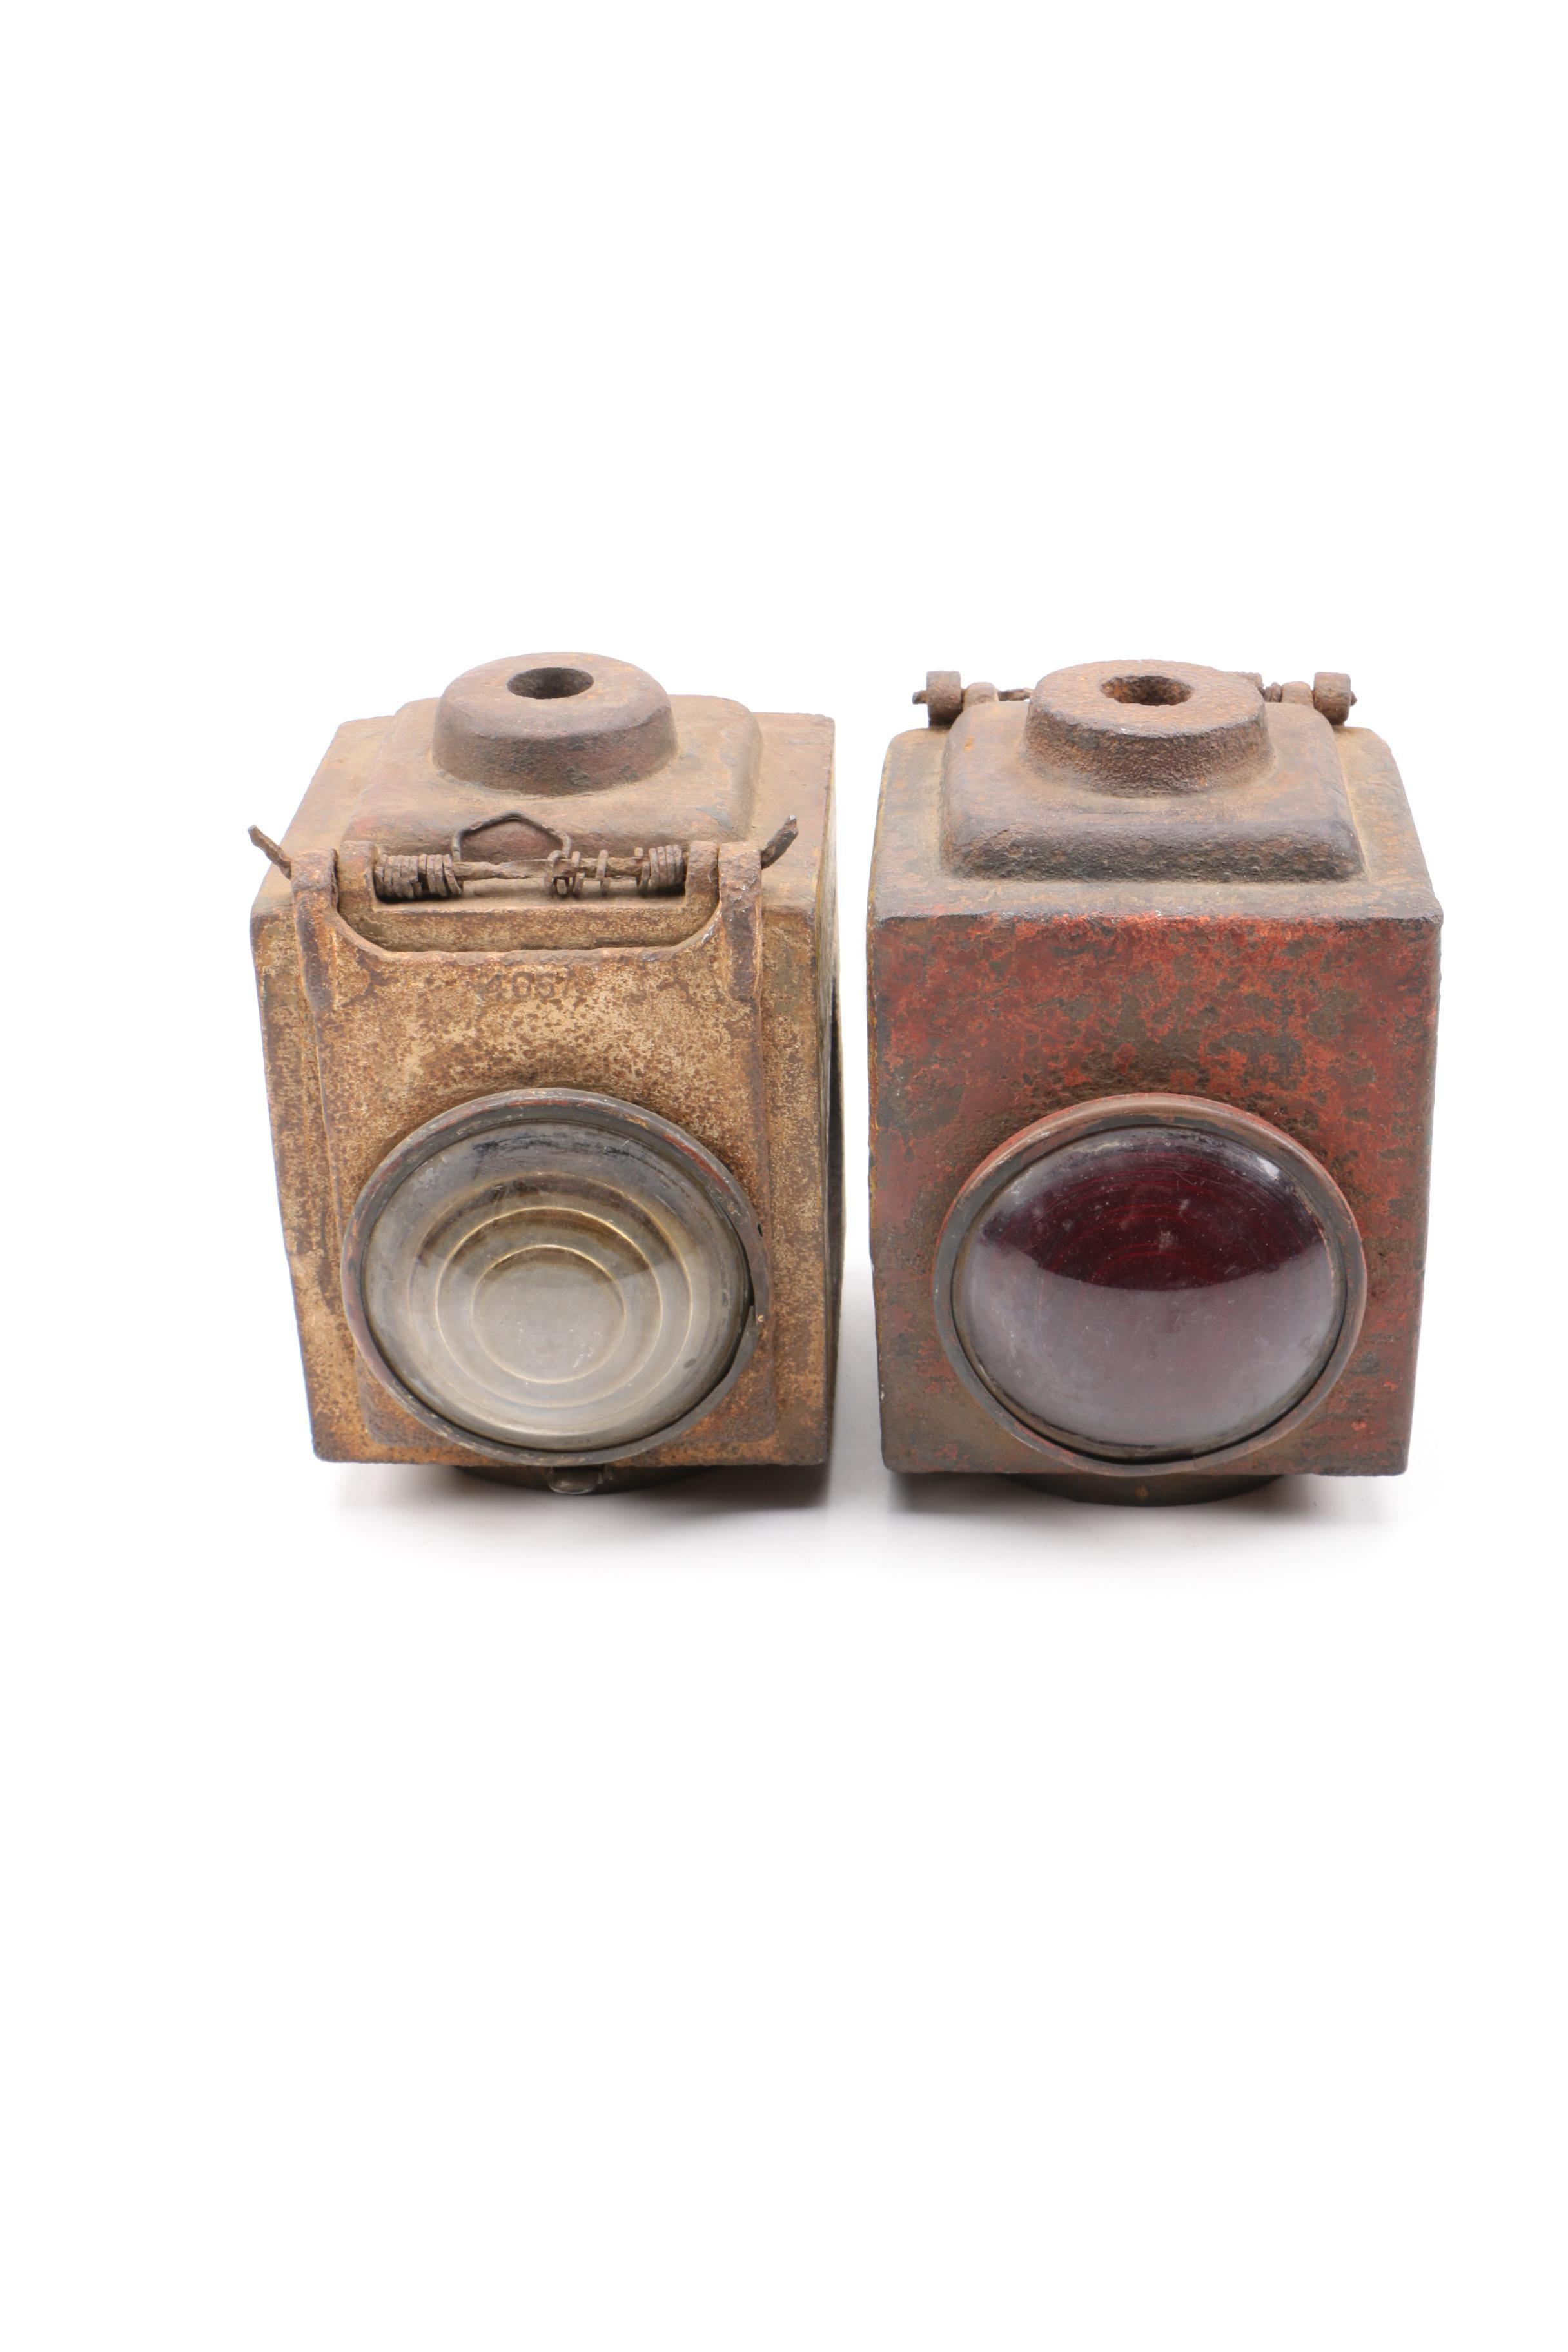 Pair of Cast Iron Railway Lanterns